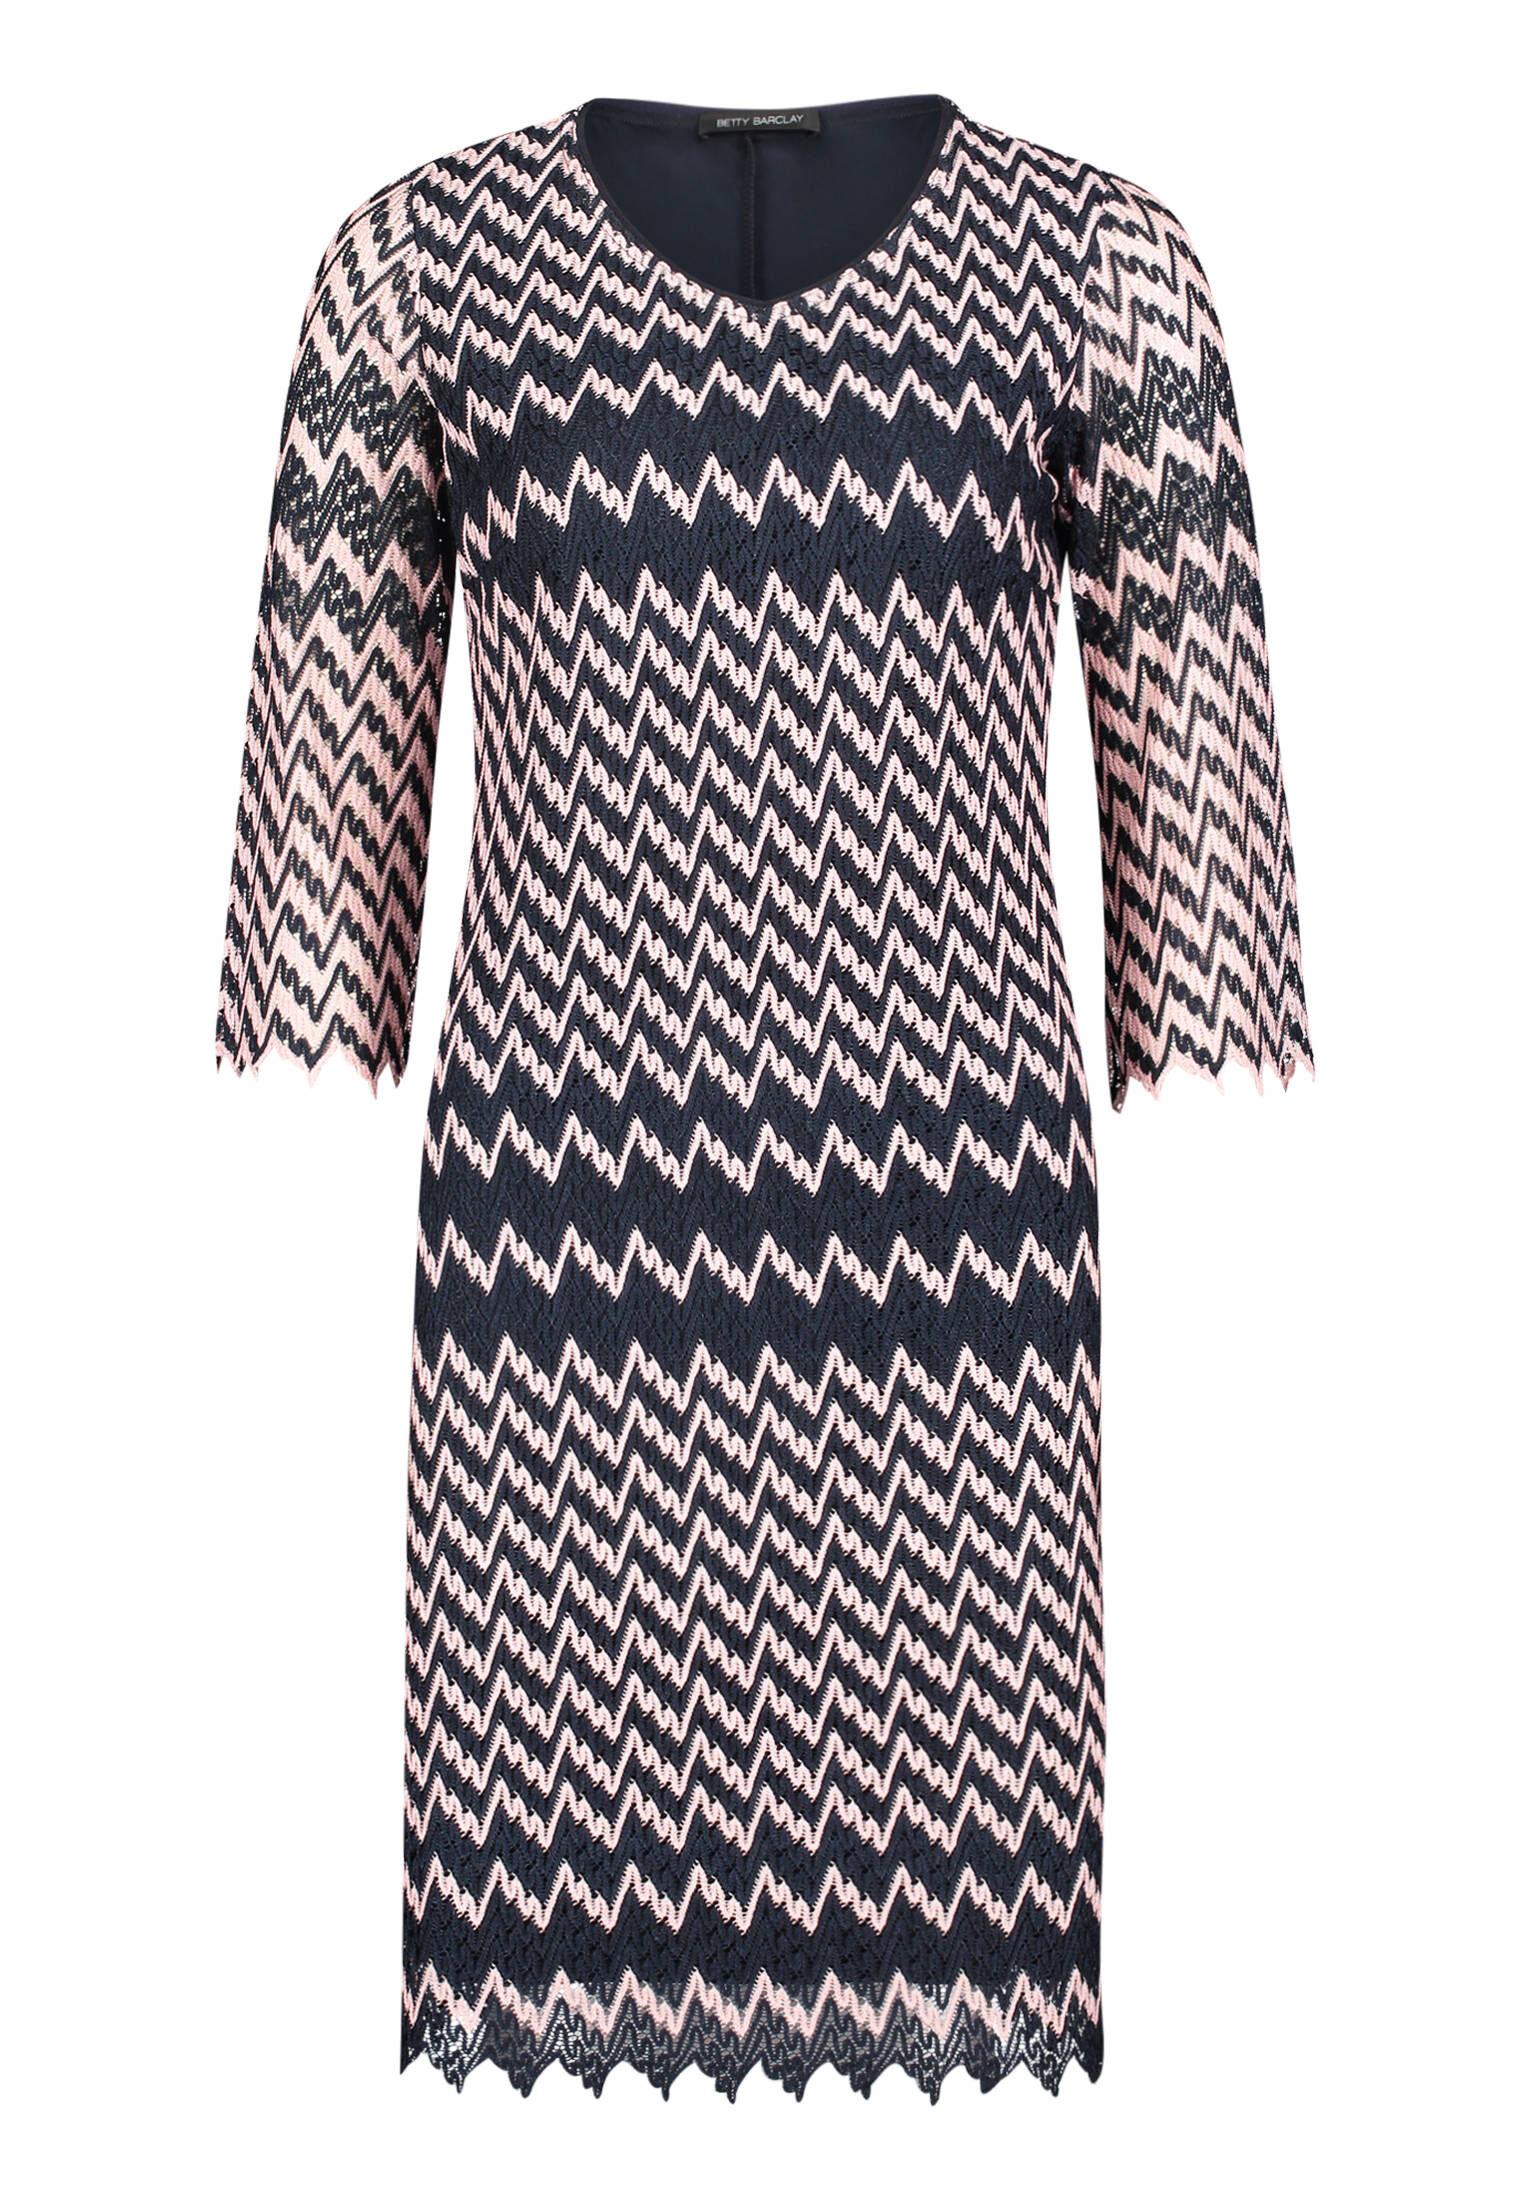 Betty Barclay Damen Kleid 3 4 Arm Kaufen Engelhorn